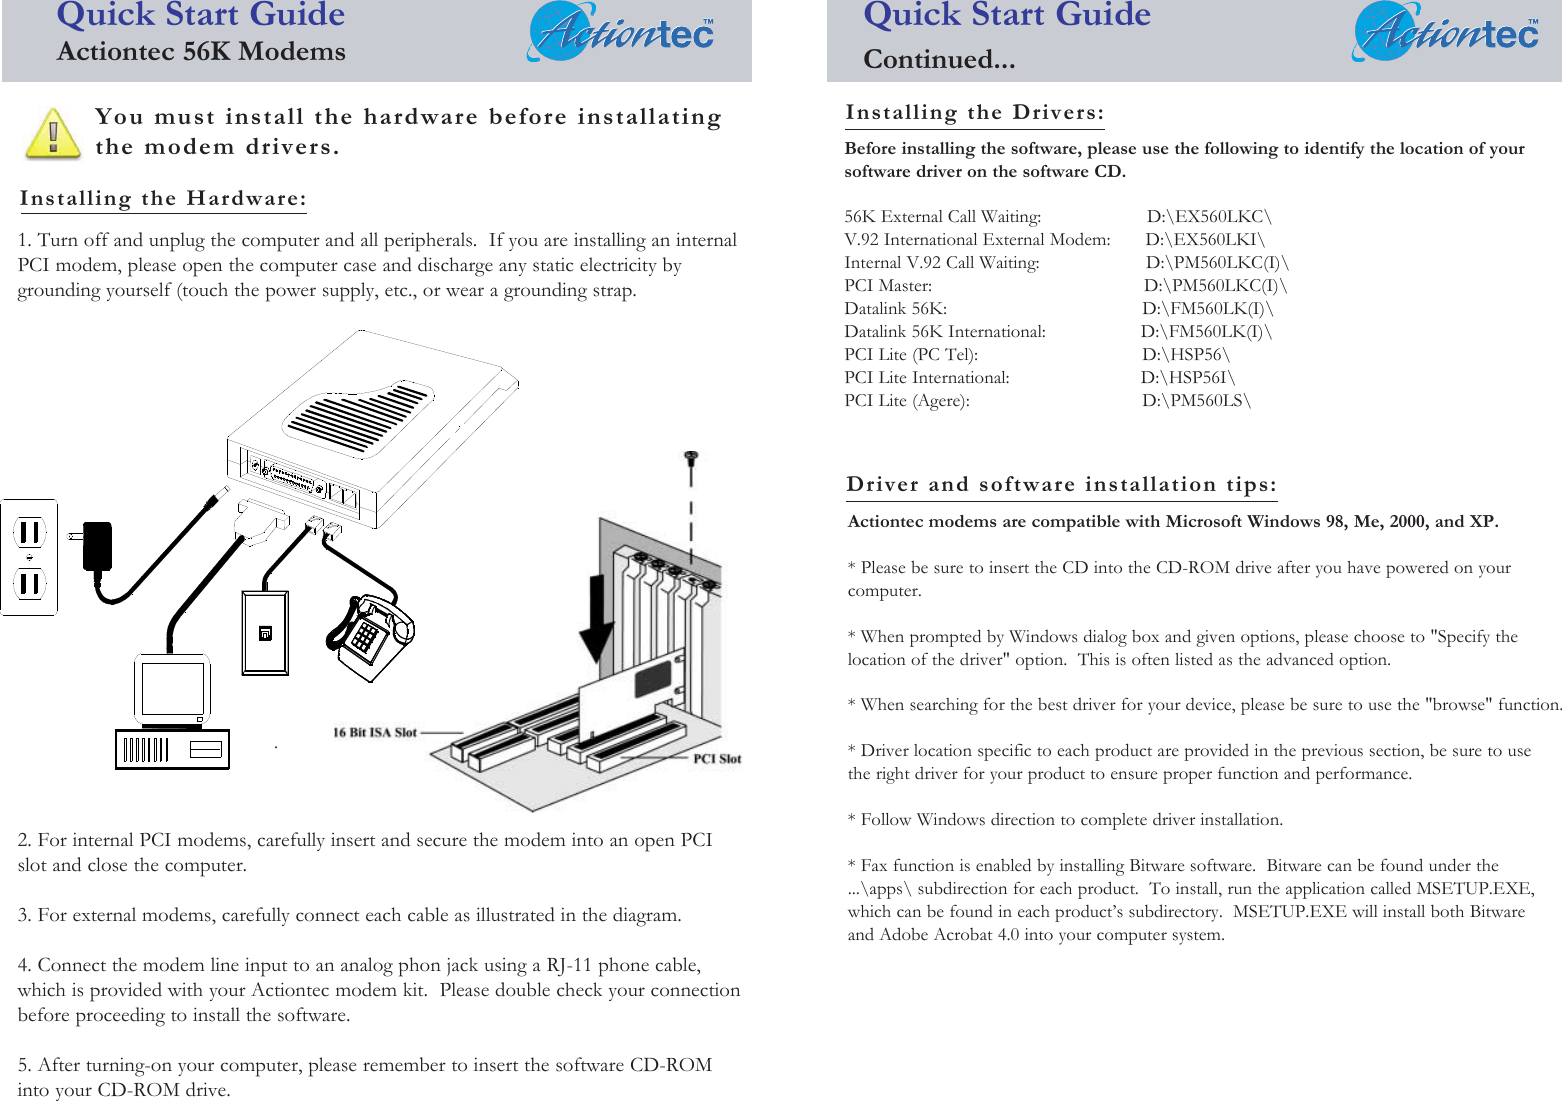 Actiontec Pm560Lki Quick Start Guide ALLMDM English